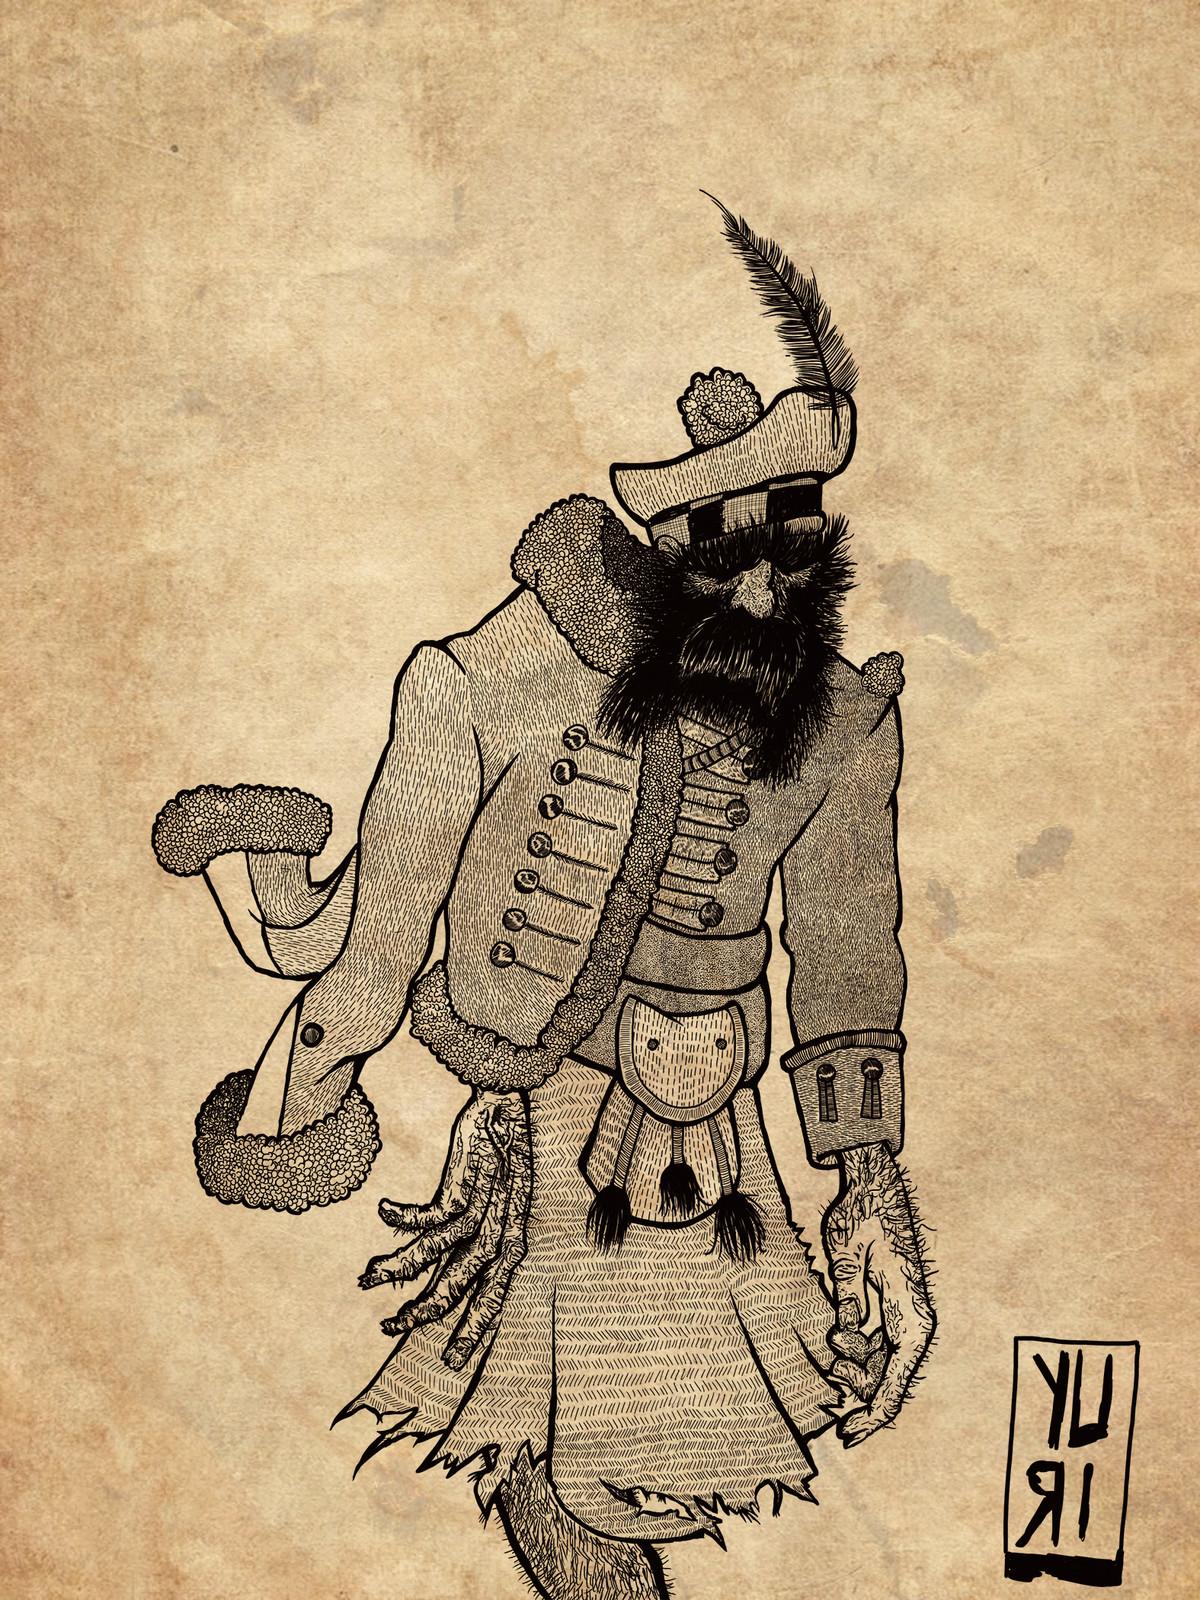 Vurr mercenary in the service of Burning Crown